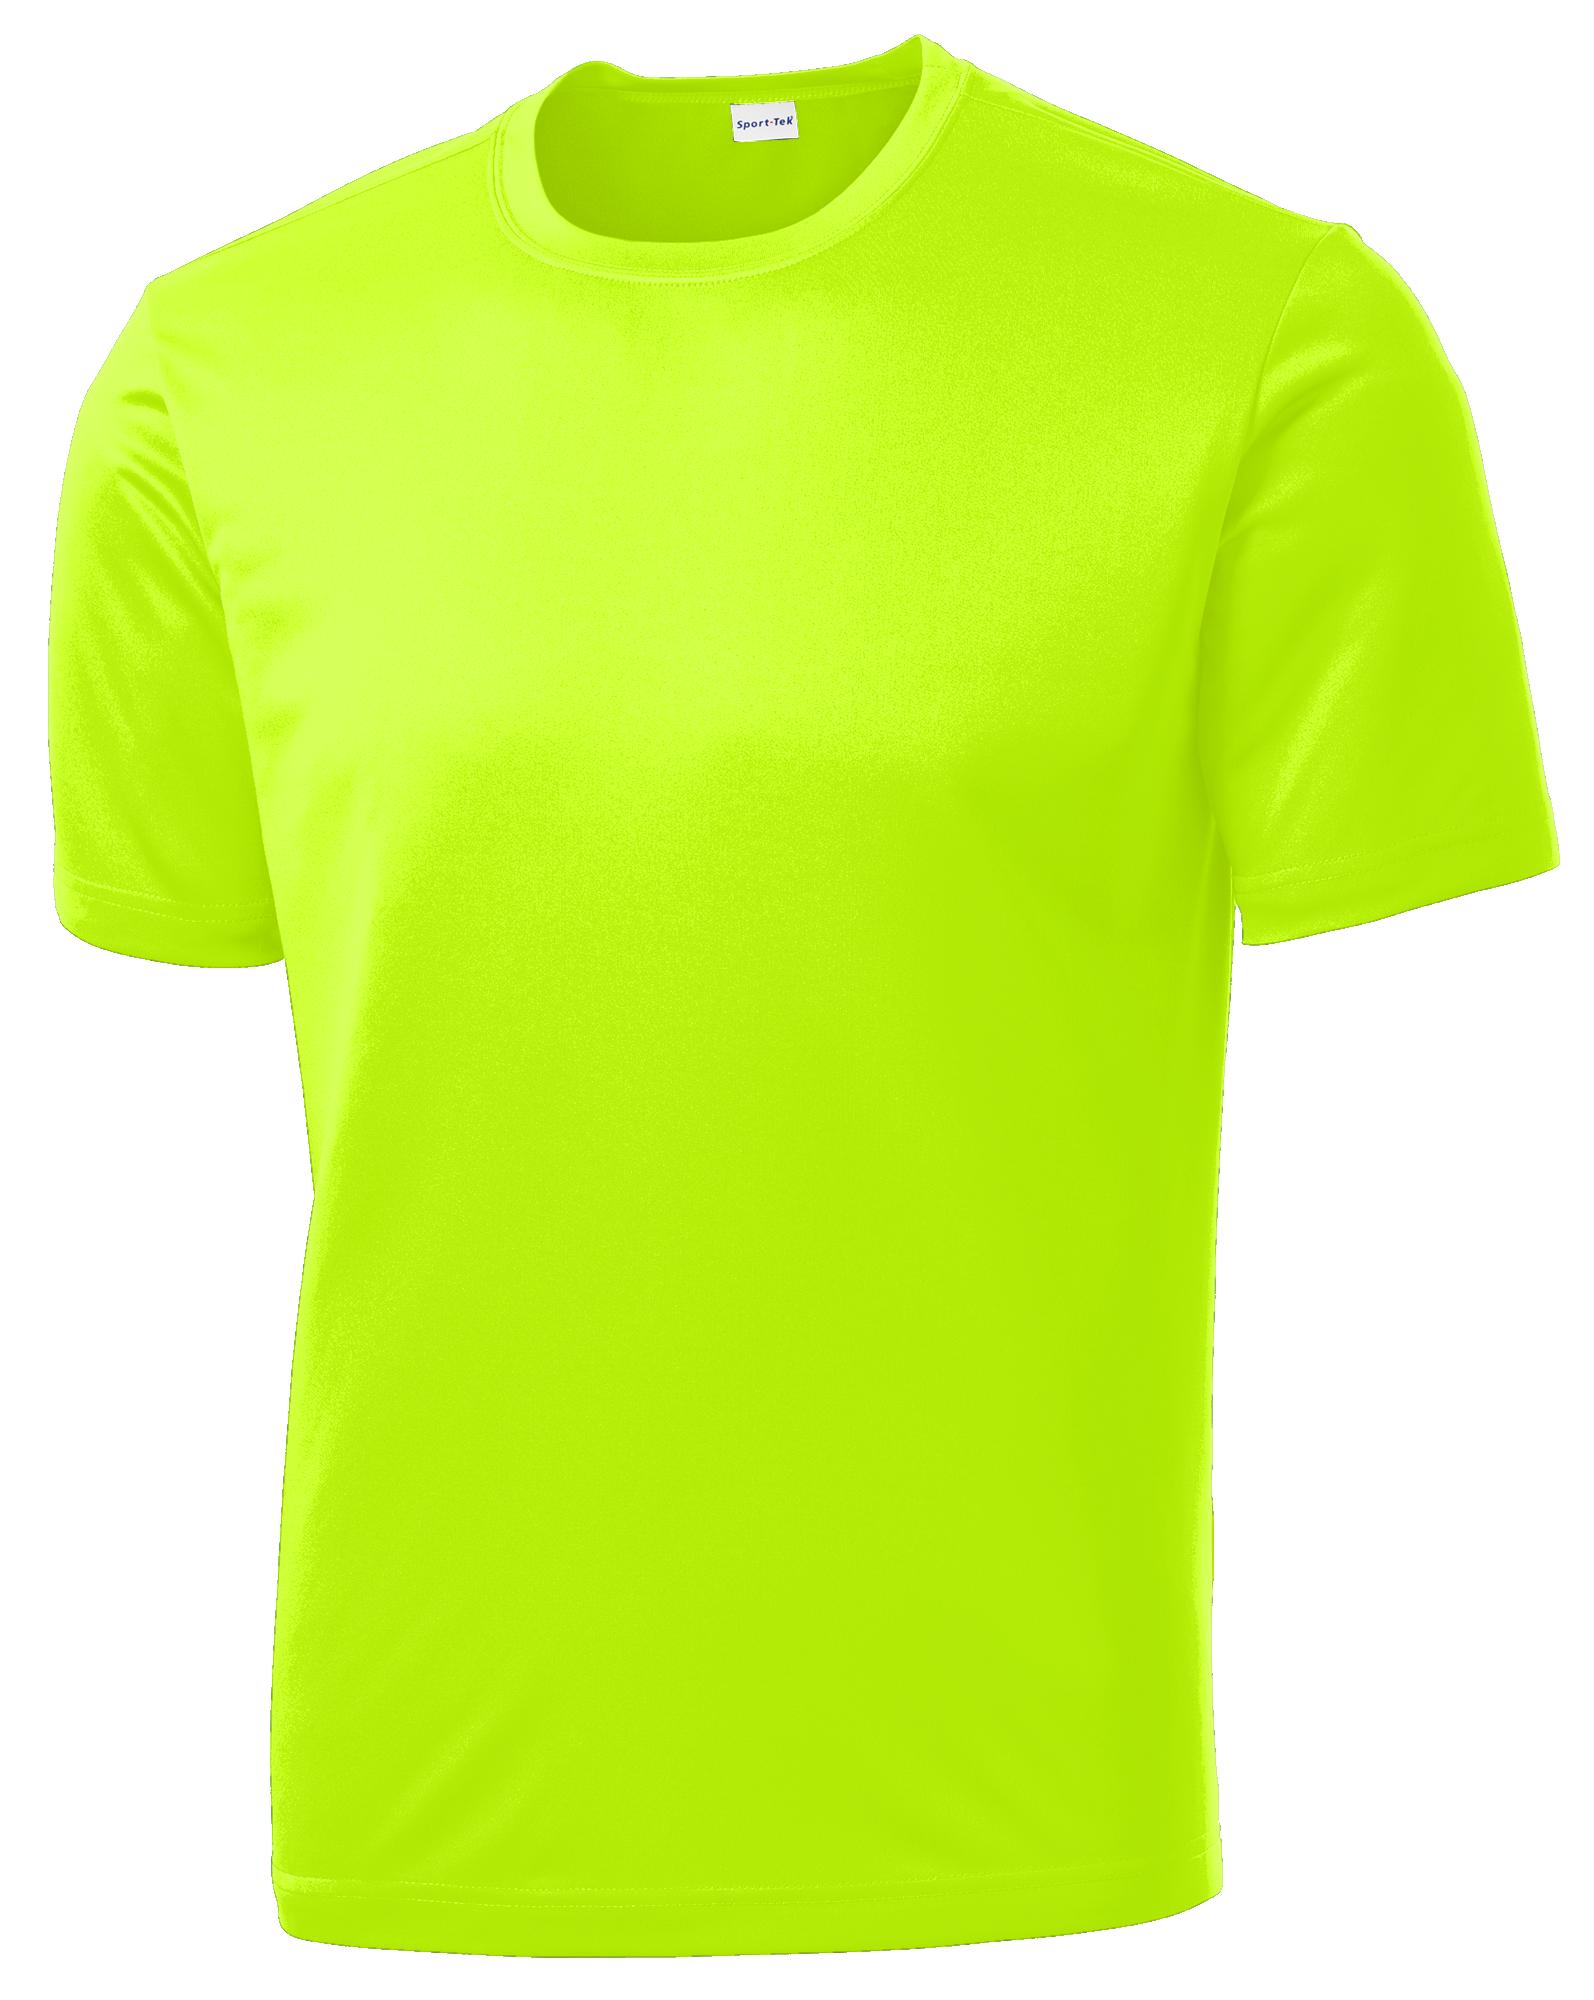 Comfort colors t shirts design comfort colors design for Neon colored t shirts wholesale